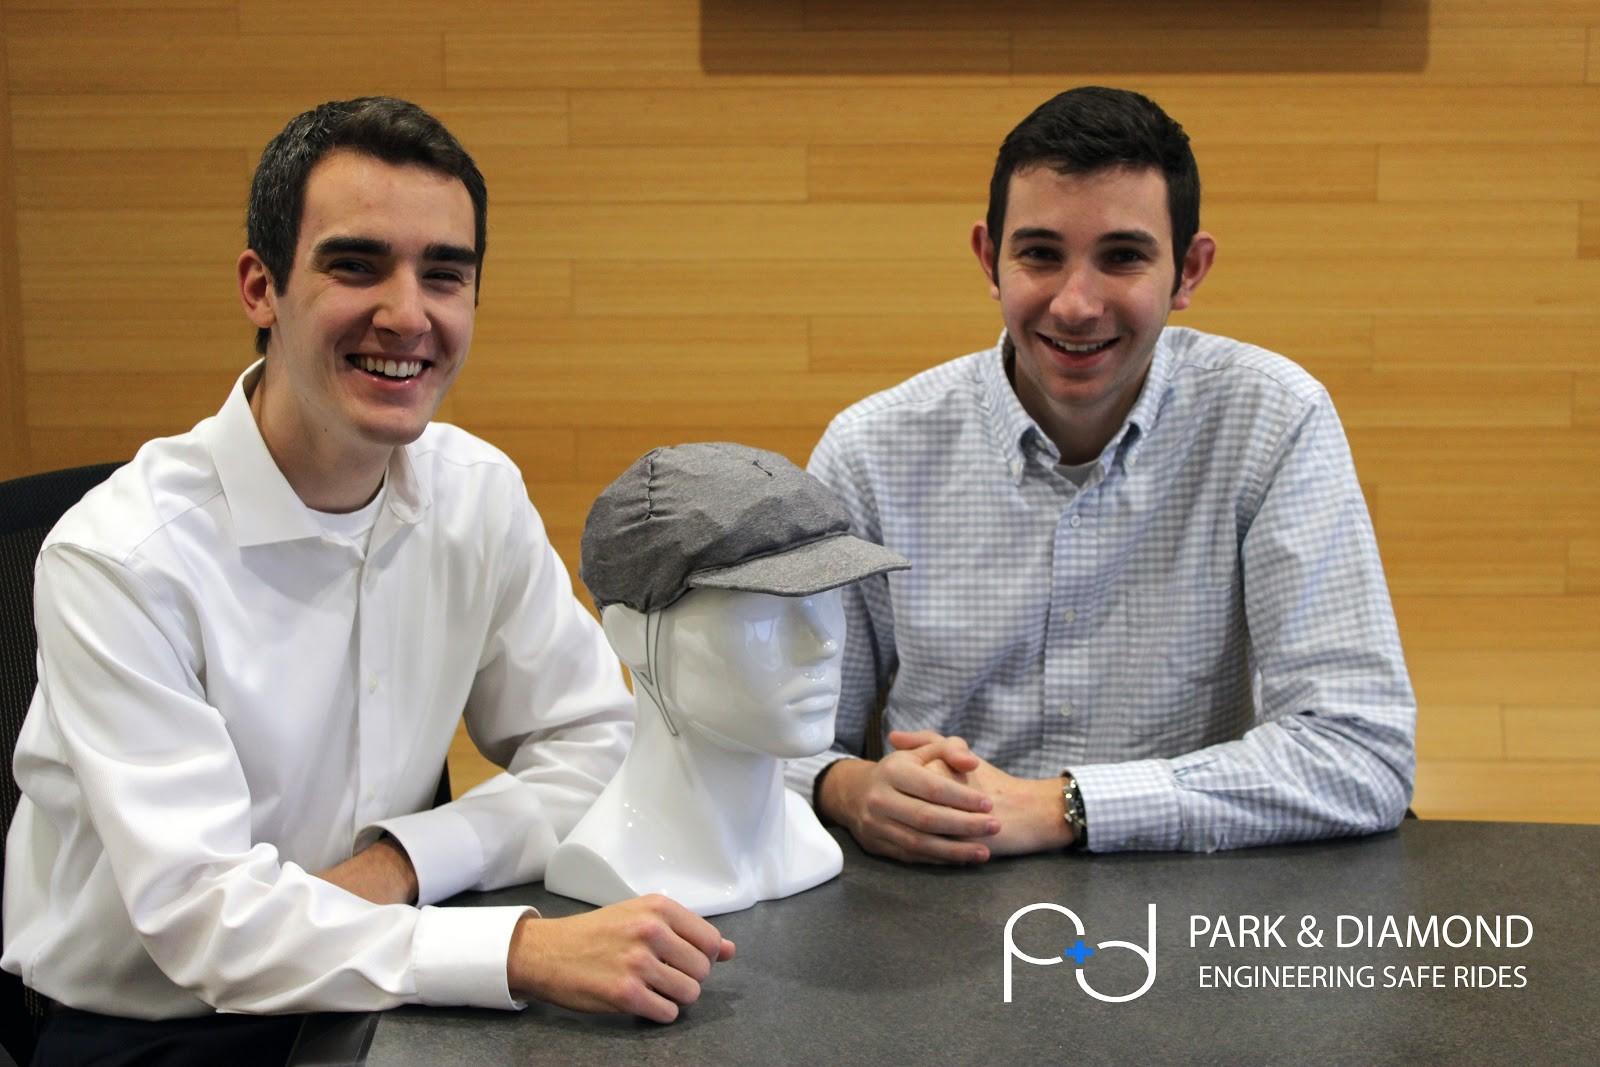 David Hall and Jordan Klein, co-founders of Park & Diamond